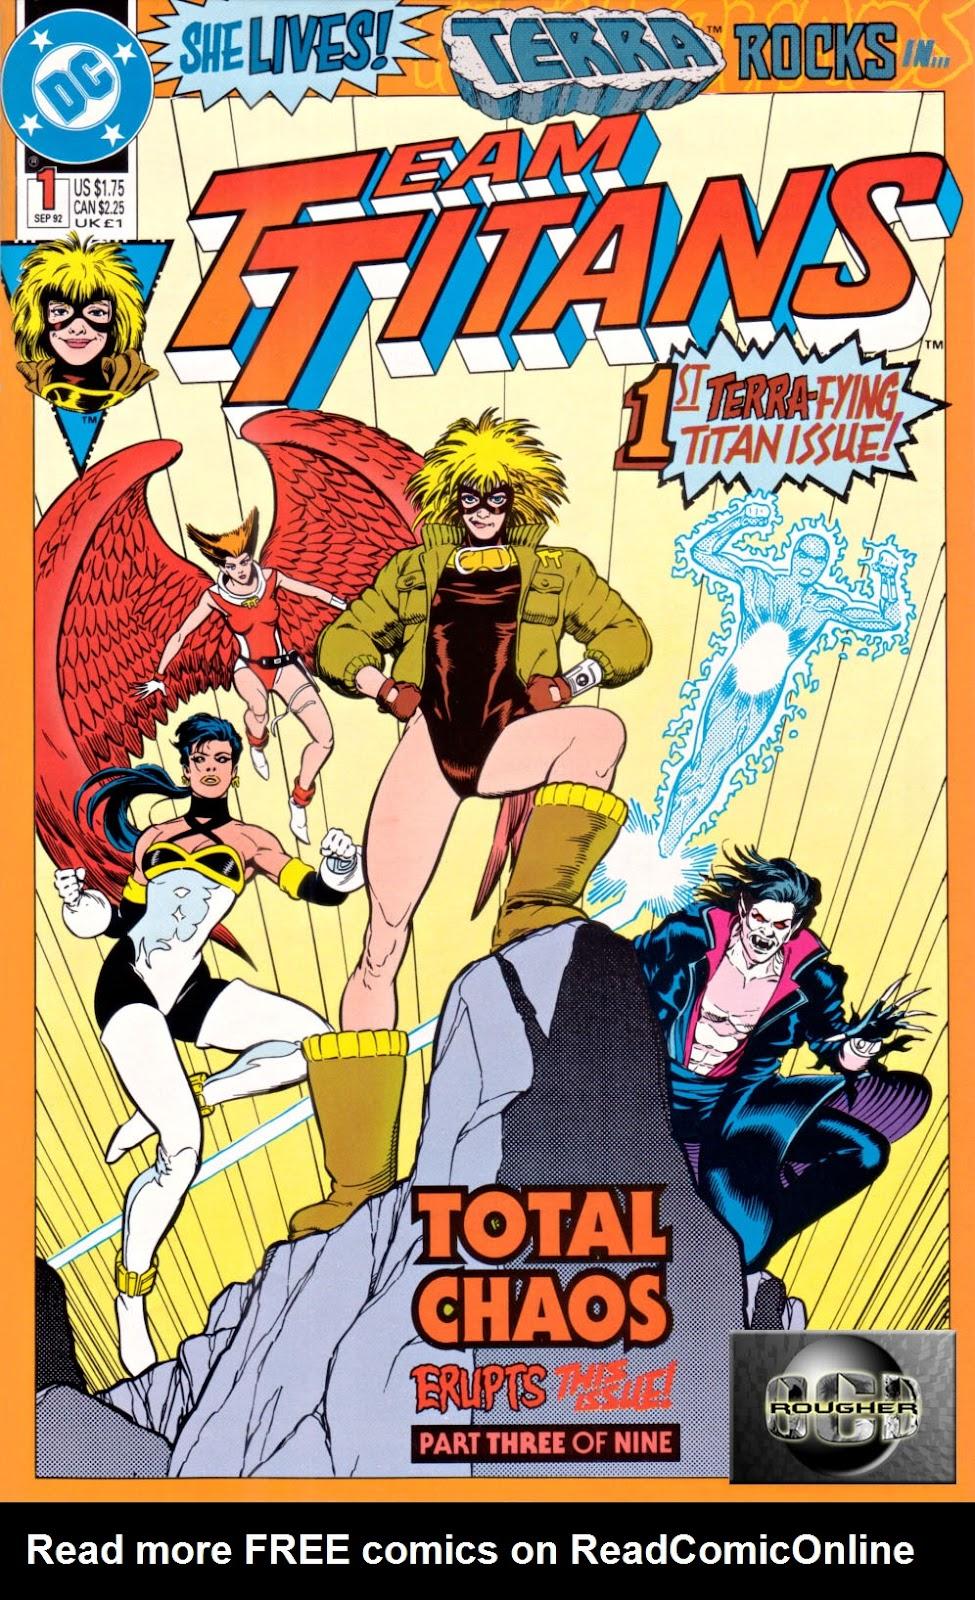 Read online Team Titans comic -  Issue #1e - 1